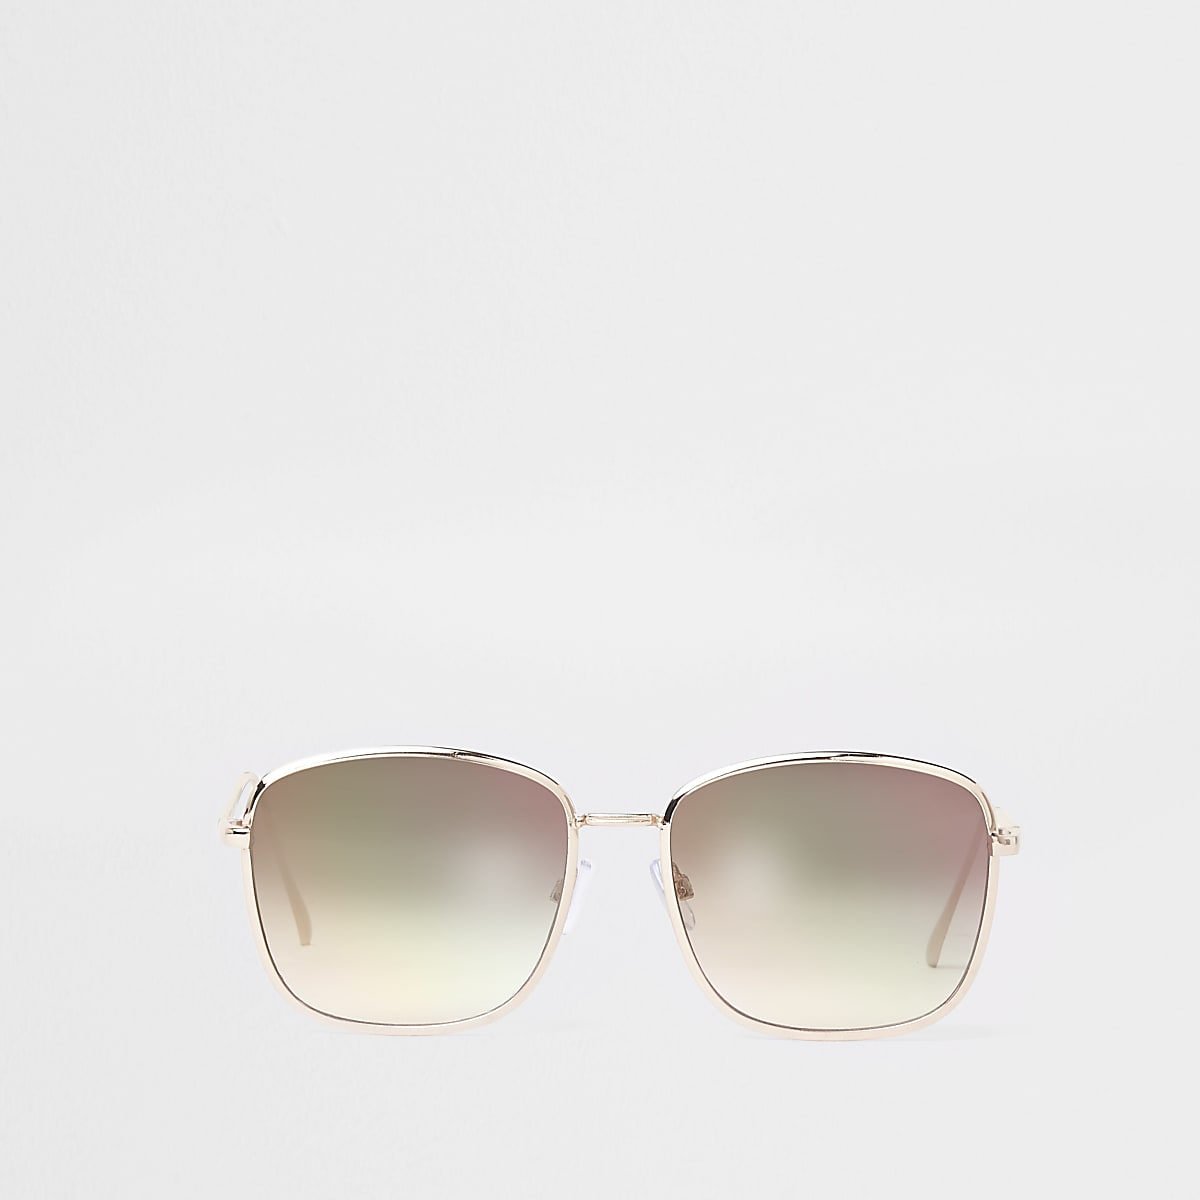 Goudkleurige pilotenzonnebril met vierkante roze glazen